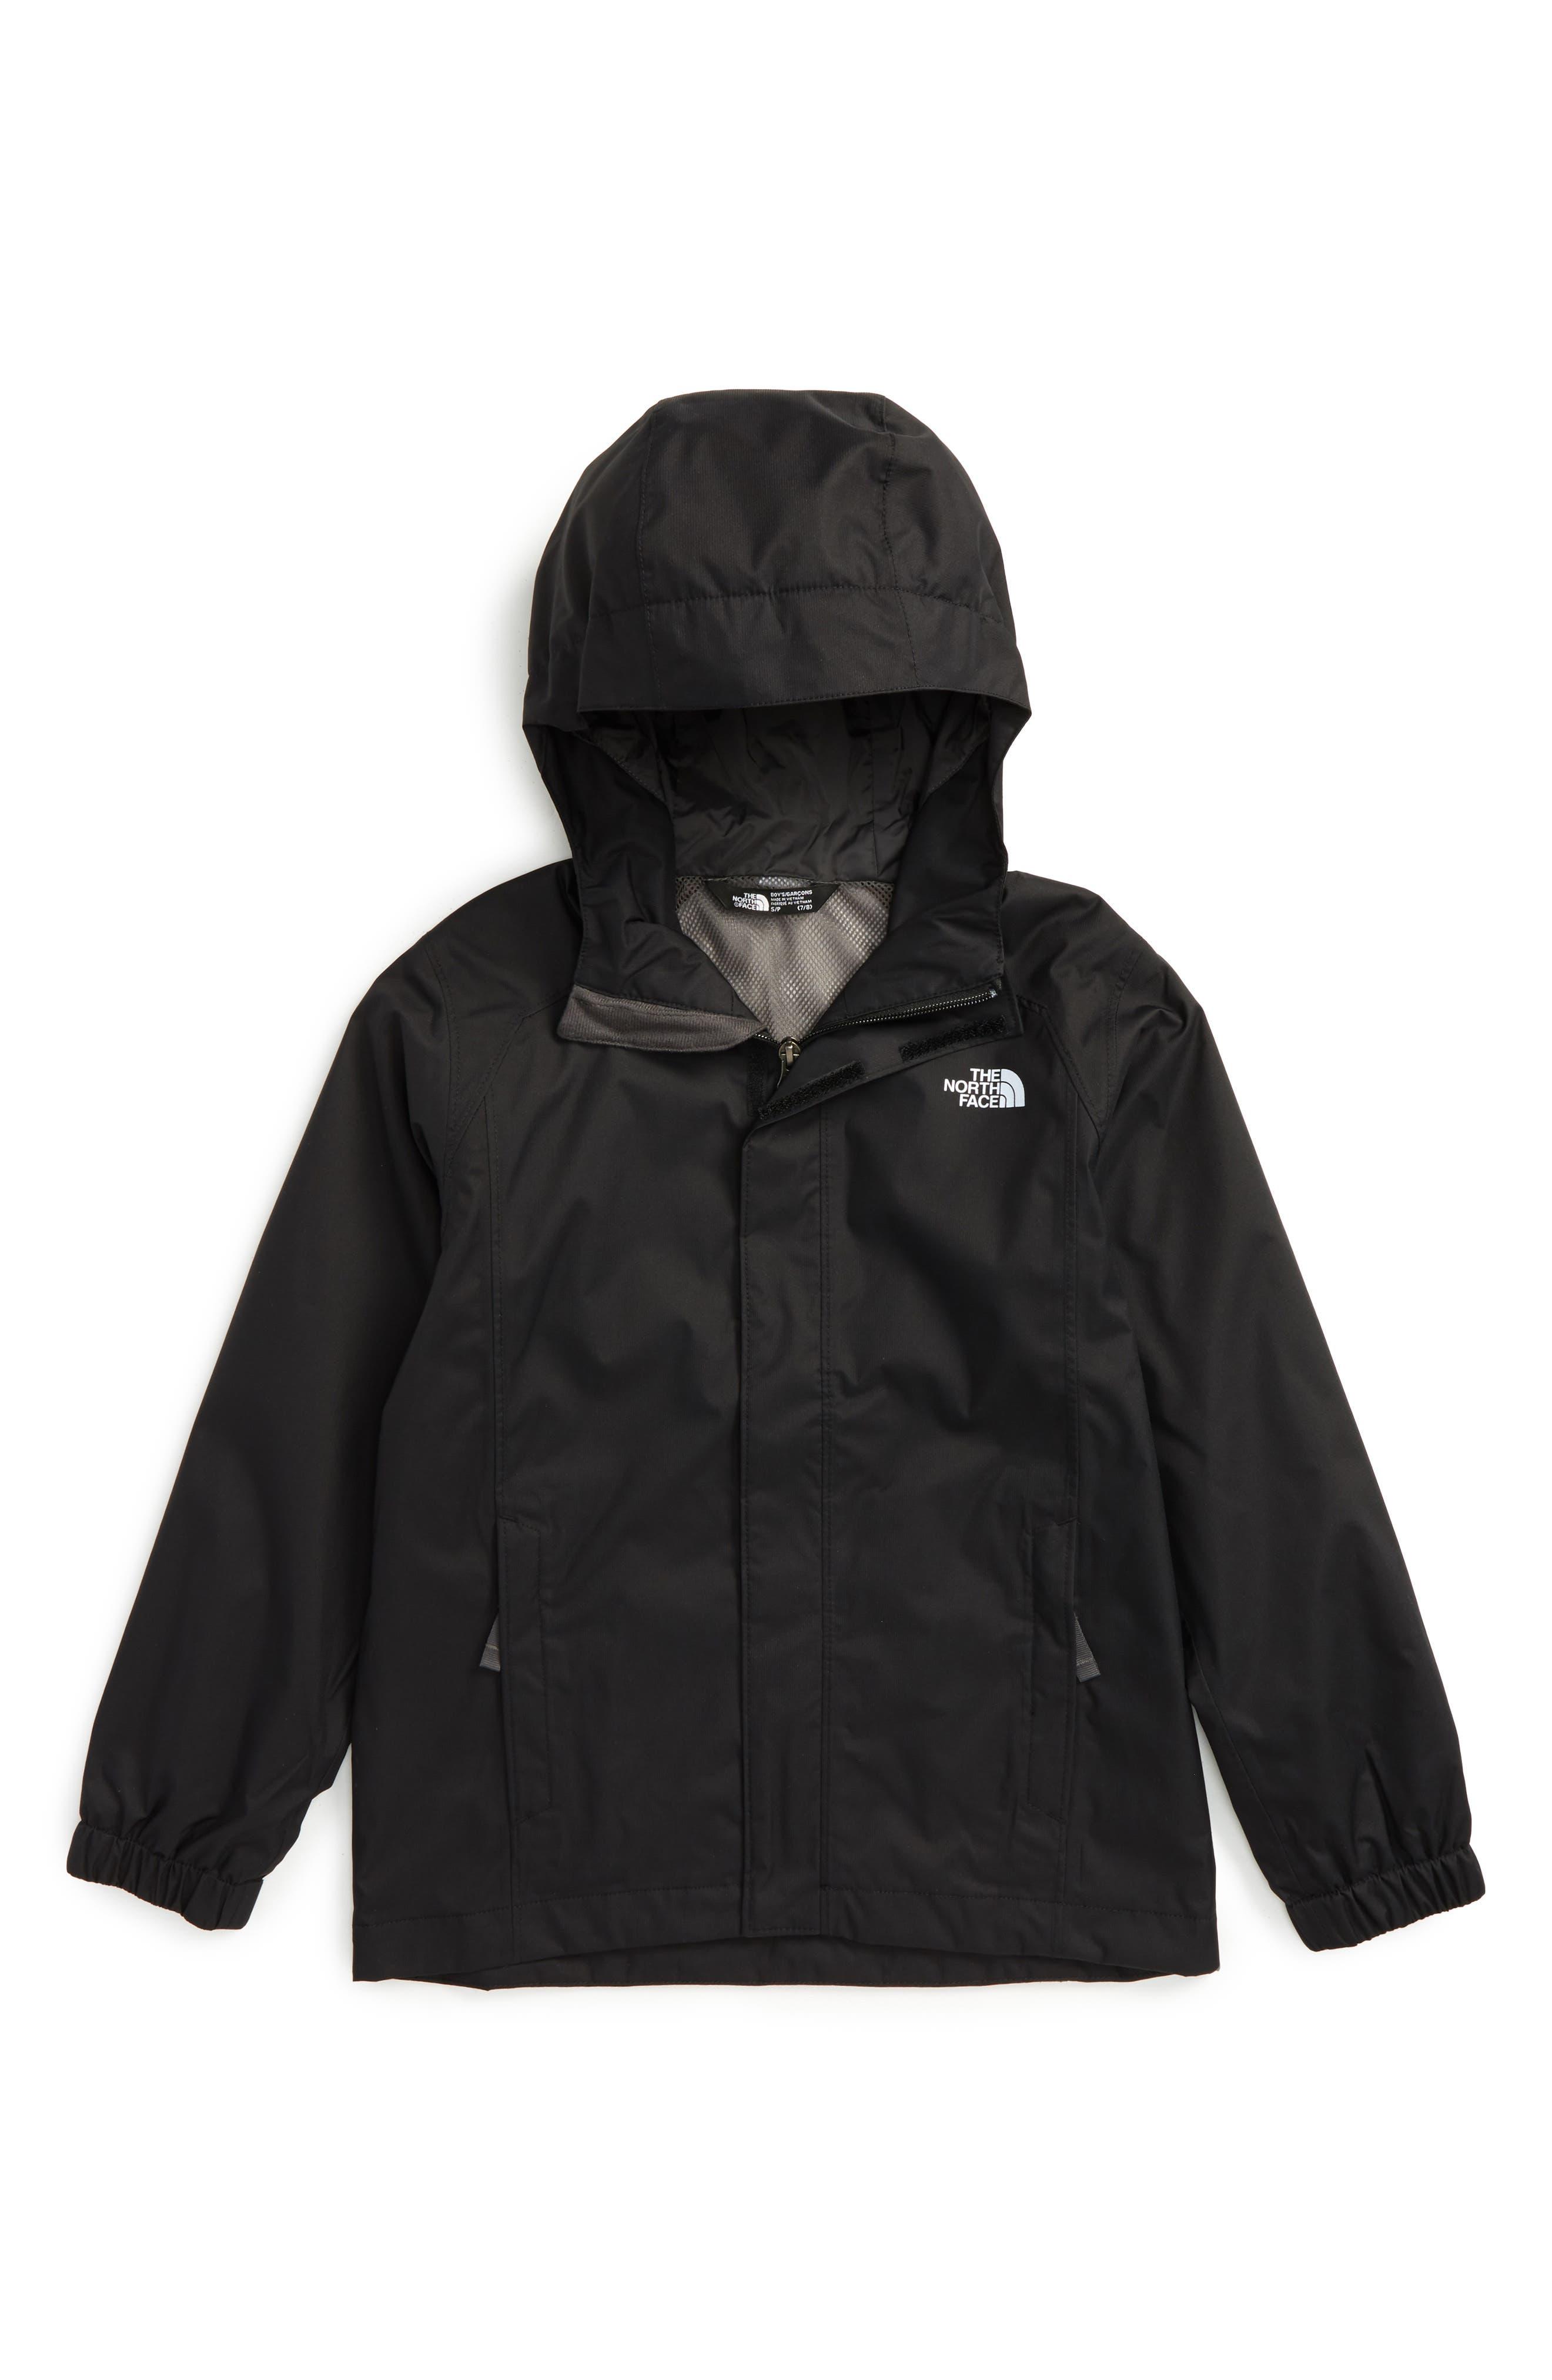 Main Image - The North Face 'Resolve' Waterproof Jacket (Big Boys)